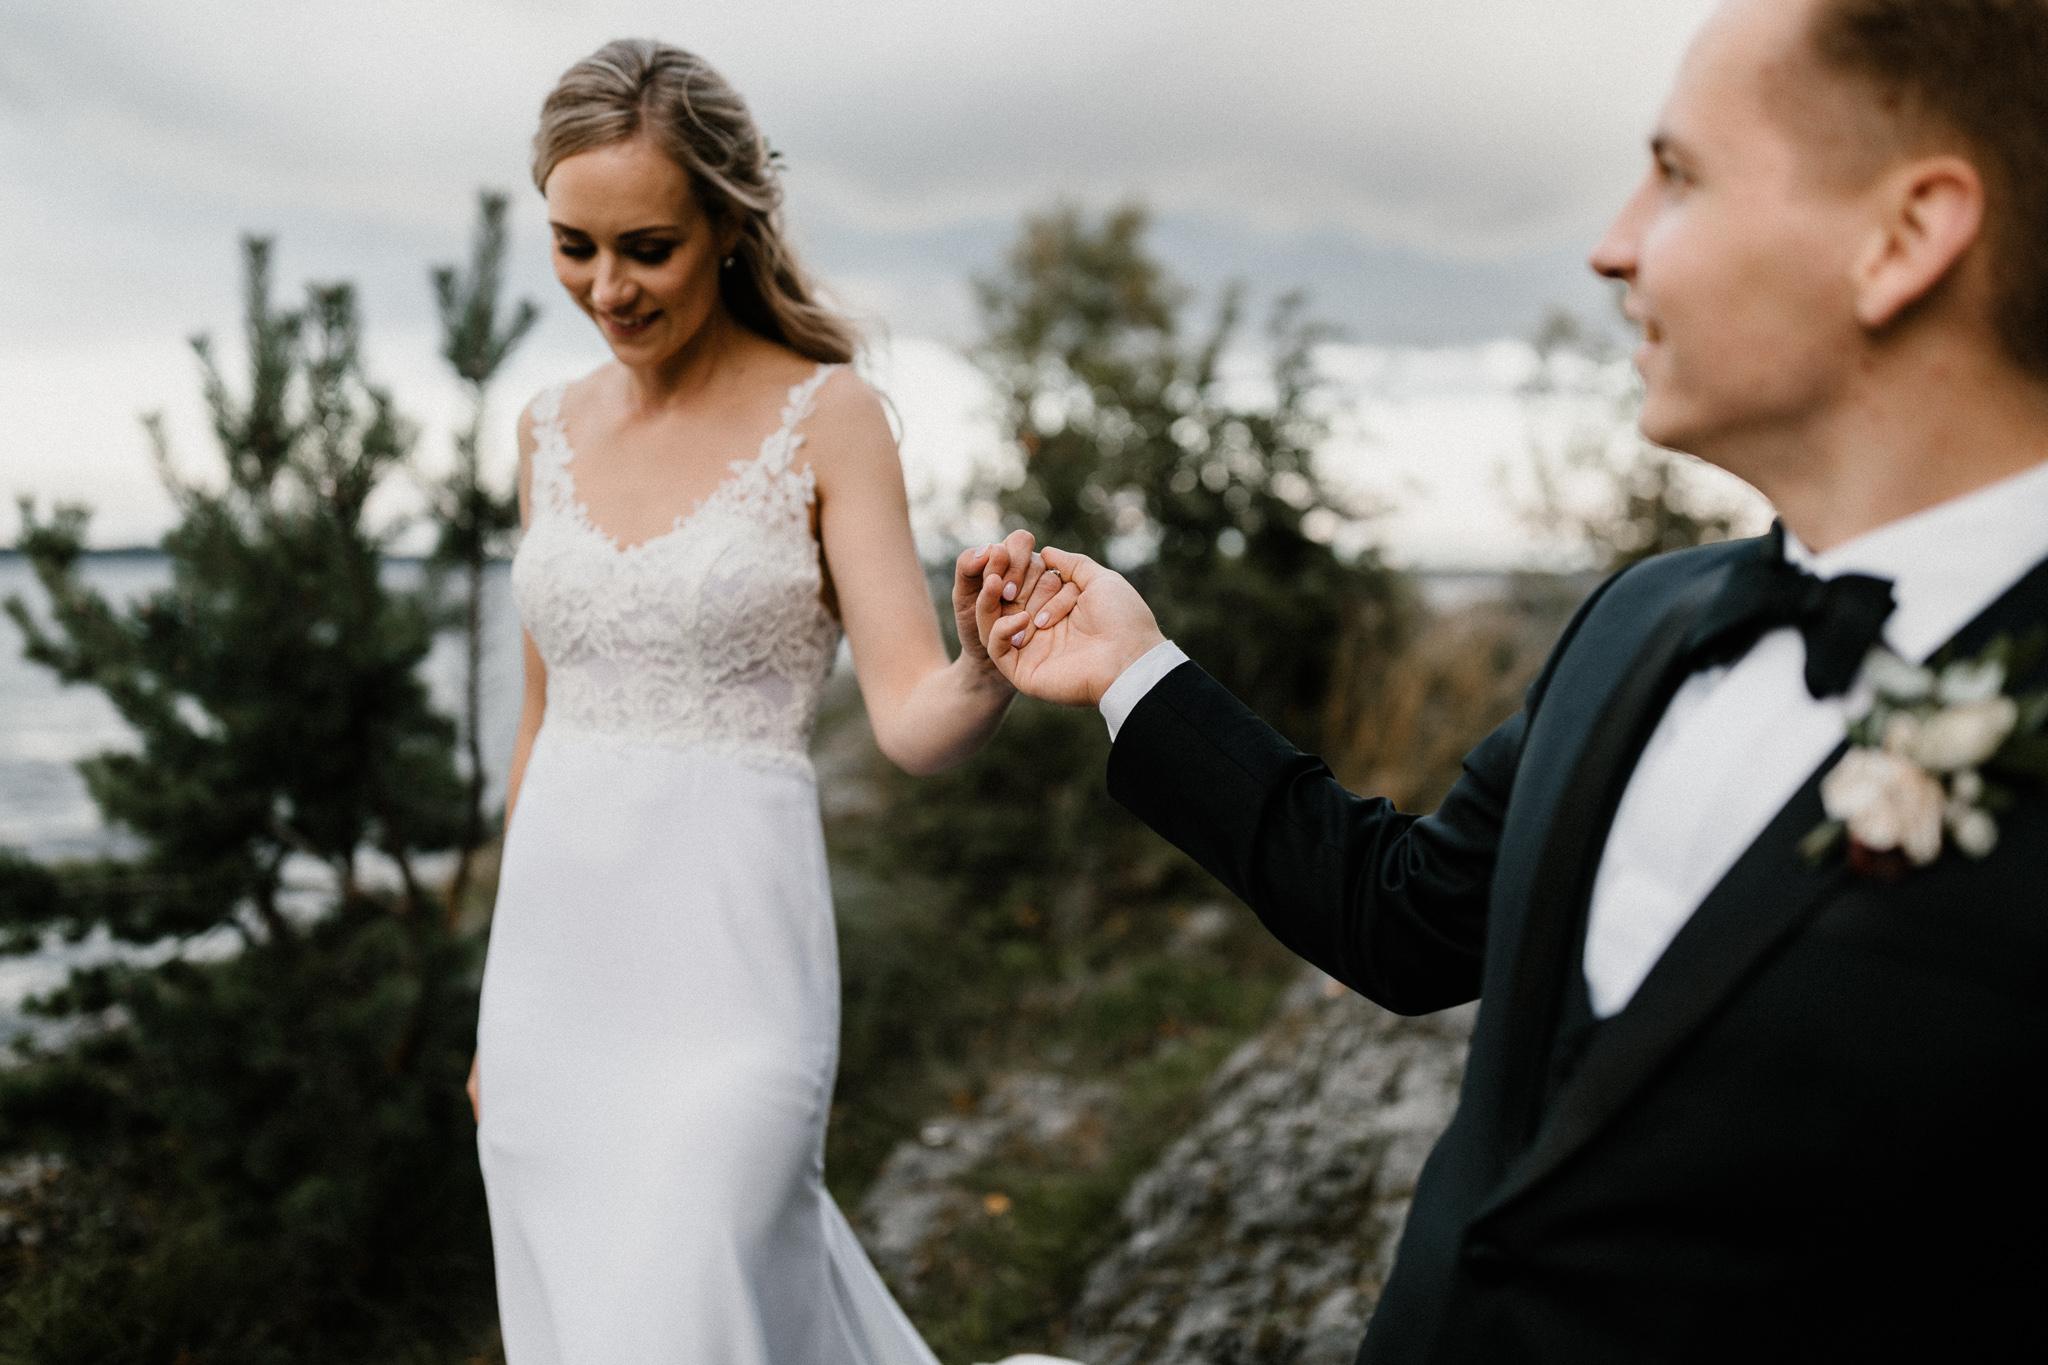 Johanna + Mikko - Tampere - Photo by Patrick Karkkolainen Wedding Photographer-150.jpg